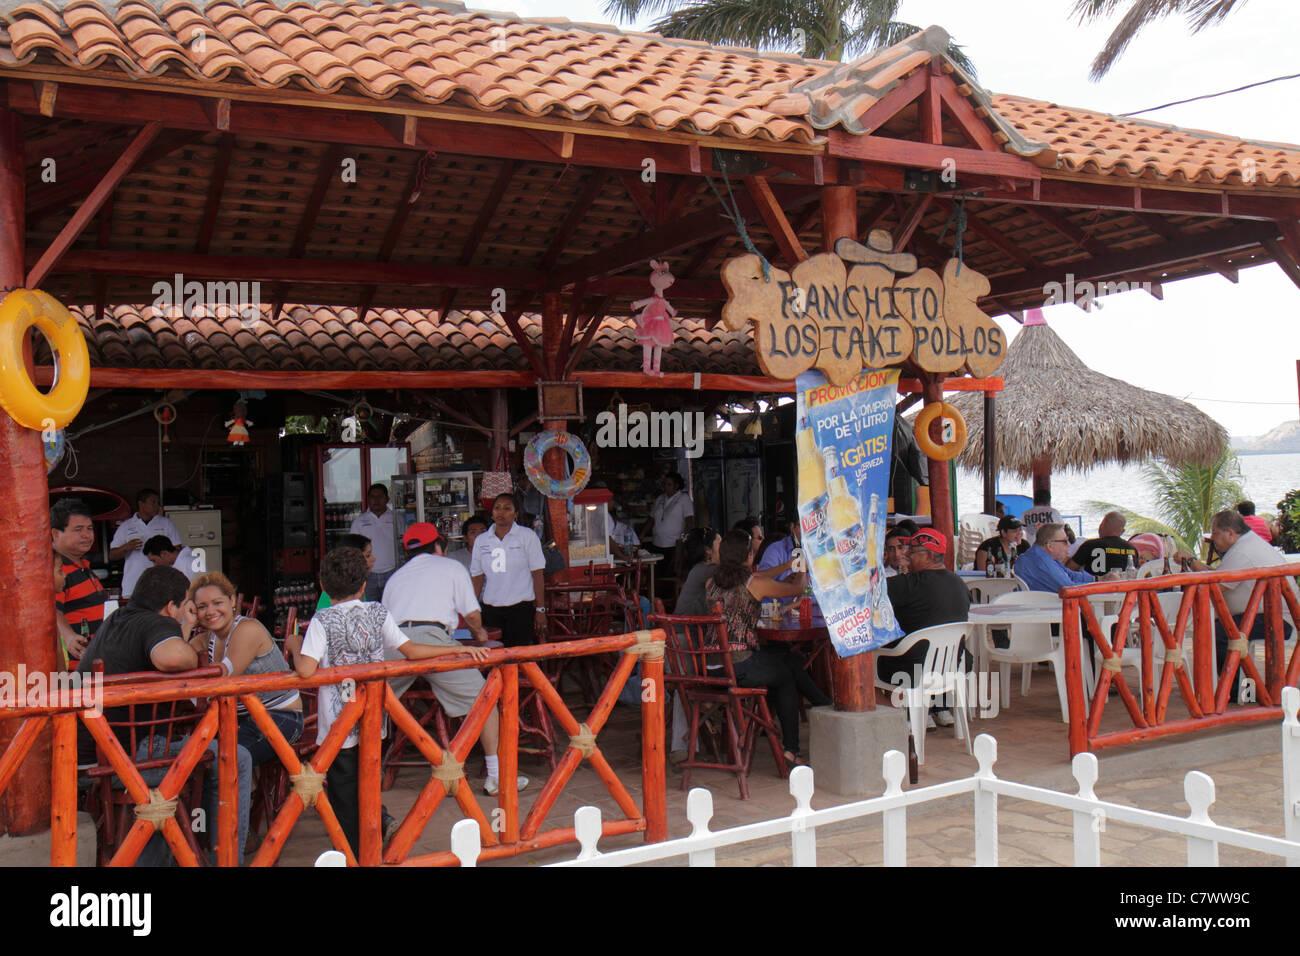 Managua Nicaragua El Malecon Puerto Salvador Allende Lake Xolotlan inland port waterfront recreational area Ranchito Stock Photo